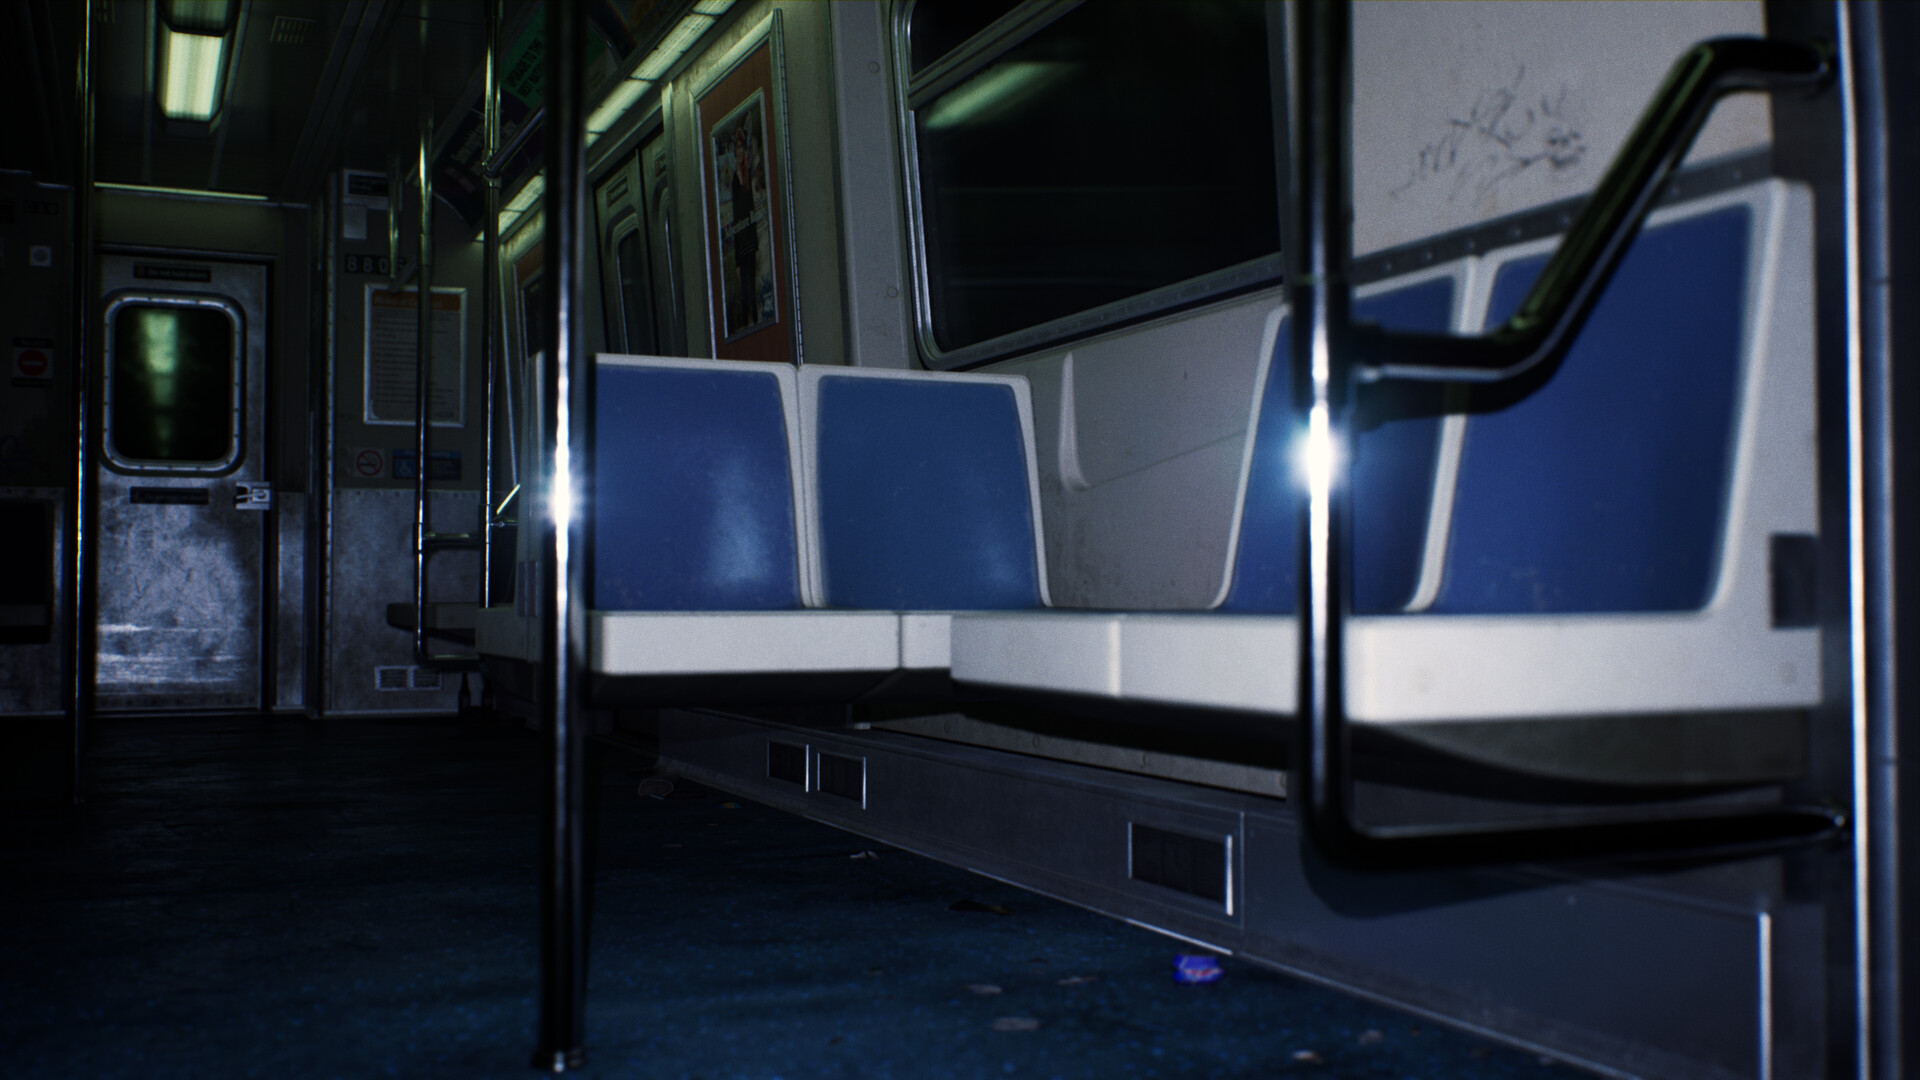 ArtStation - Unreal Engine 4 Subway Train